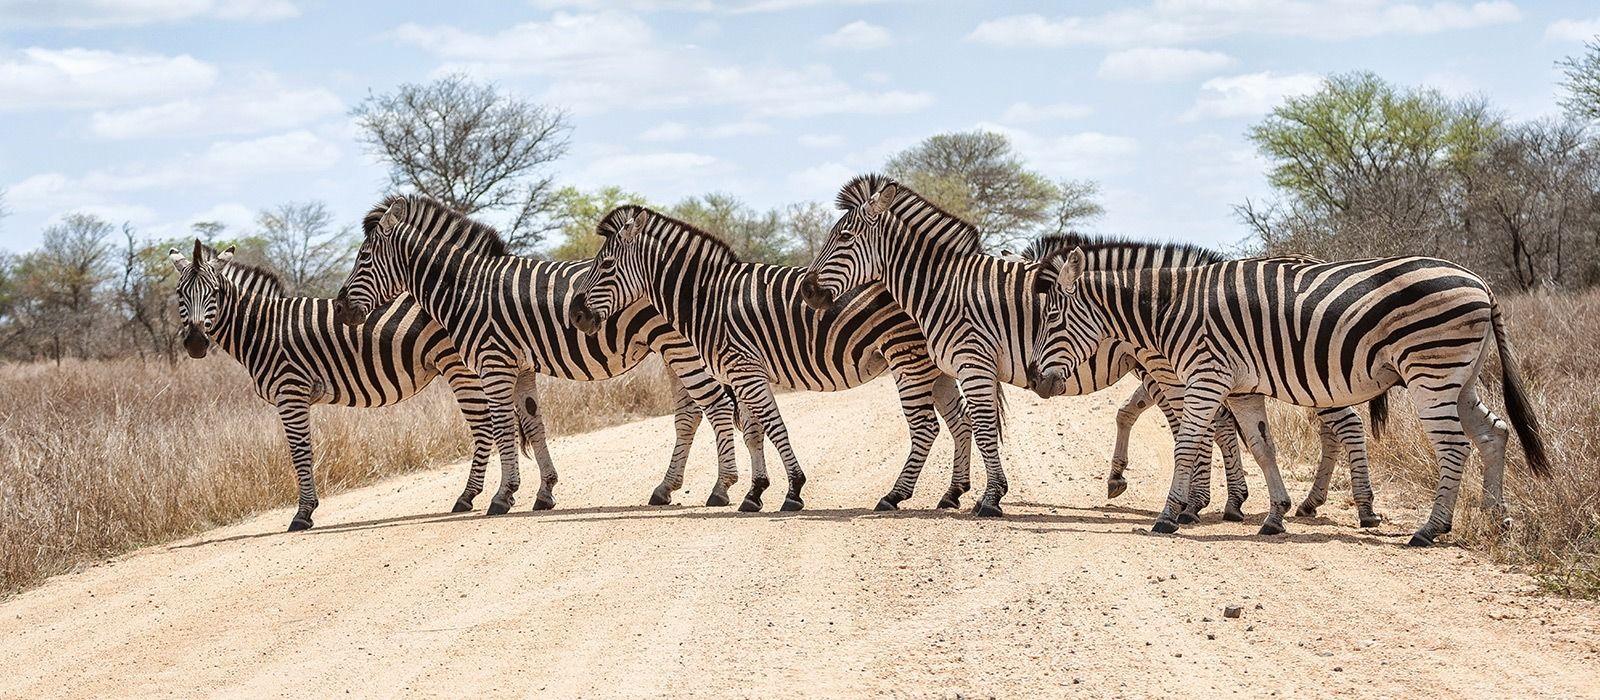 Südafrika & Sambia: Kapstadt, Krüger und Victoriafälle Urlaub 2